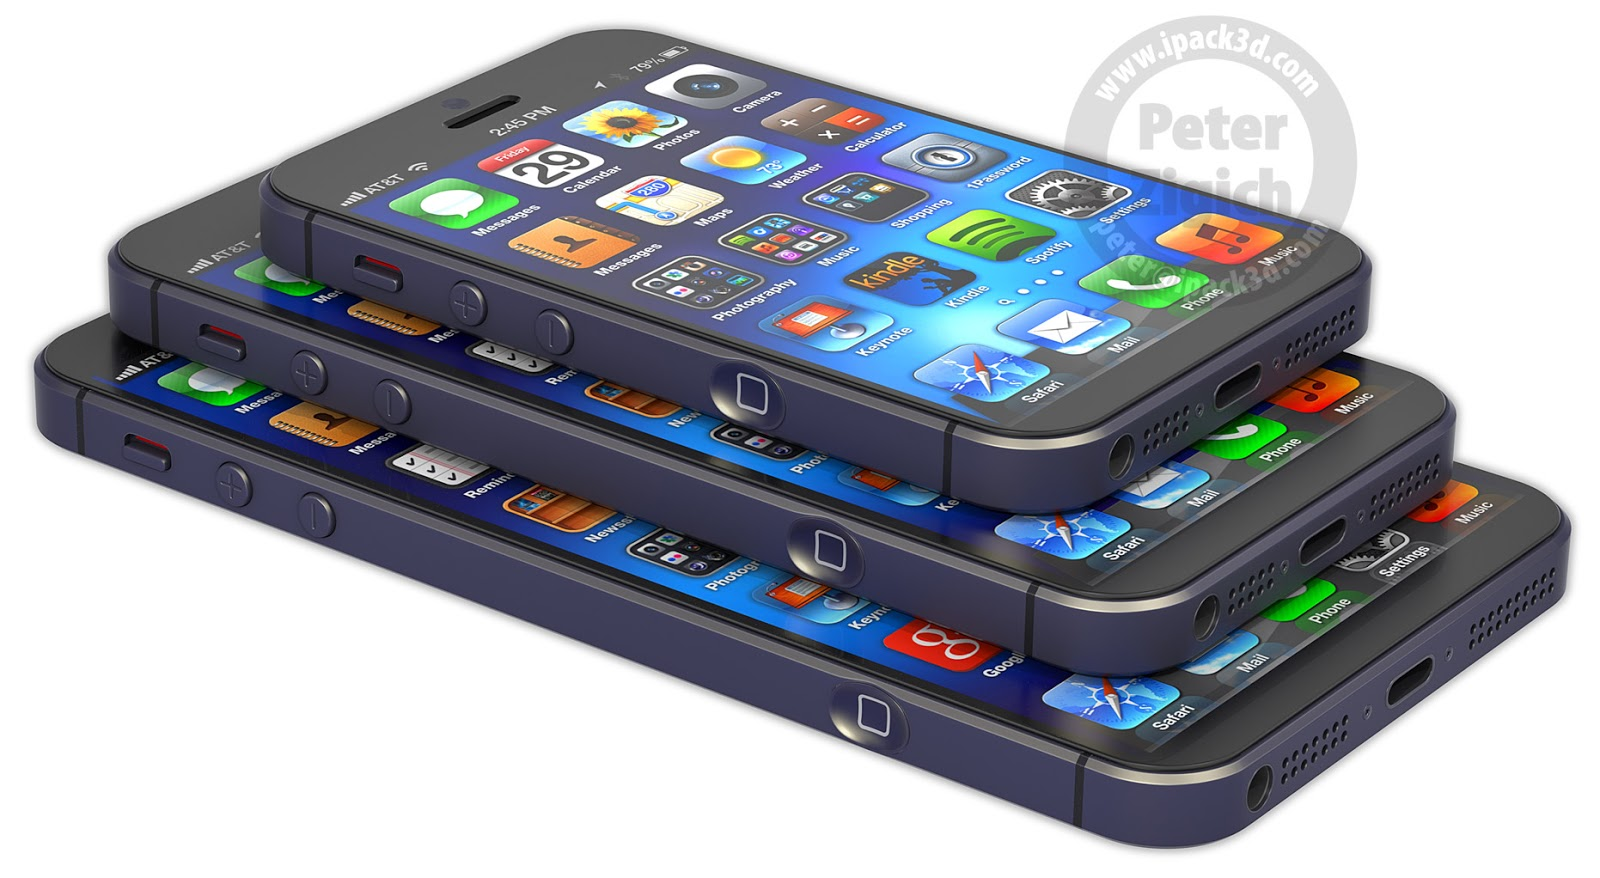 Set up new iphone 6 icloud